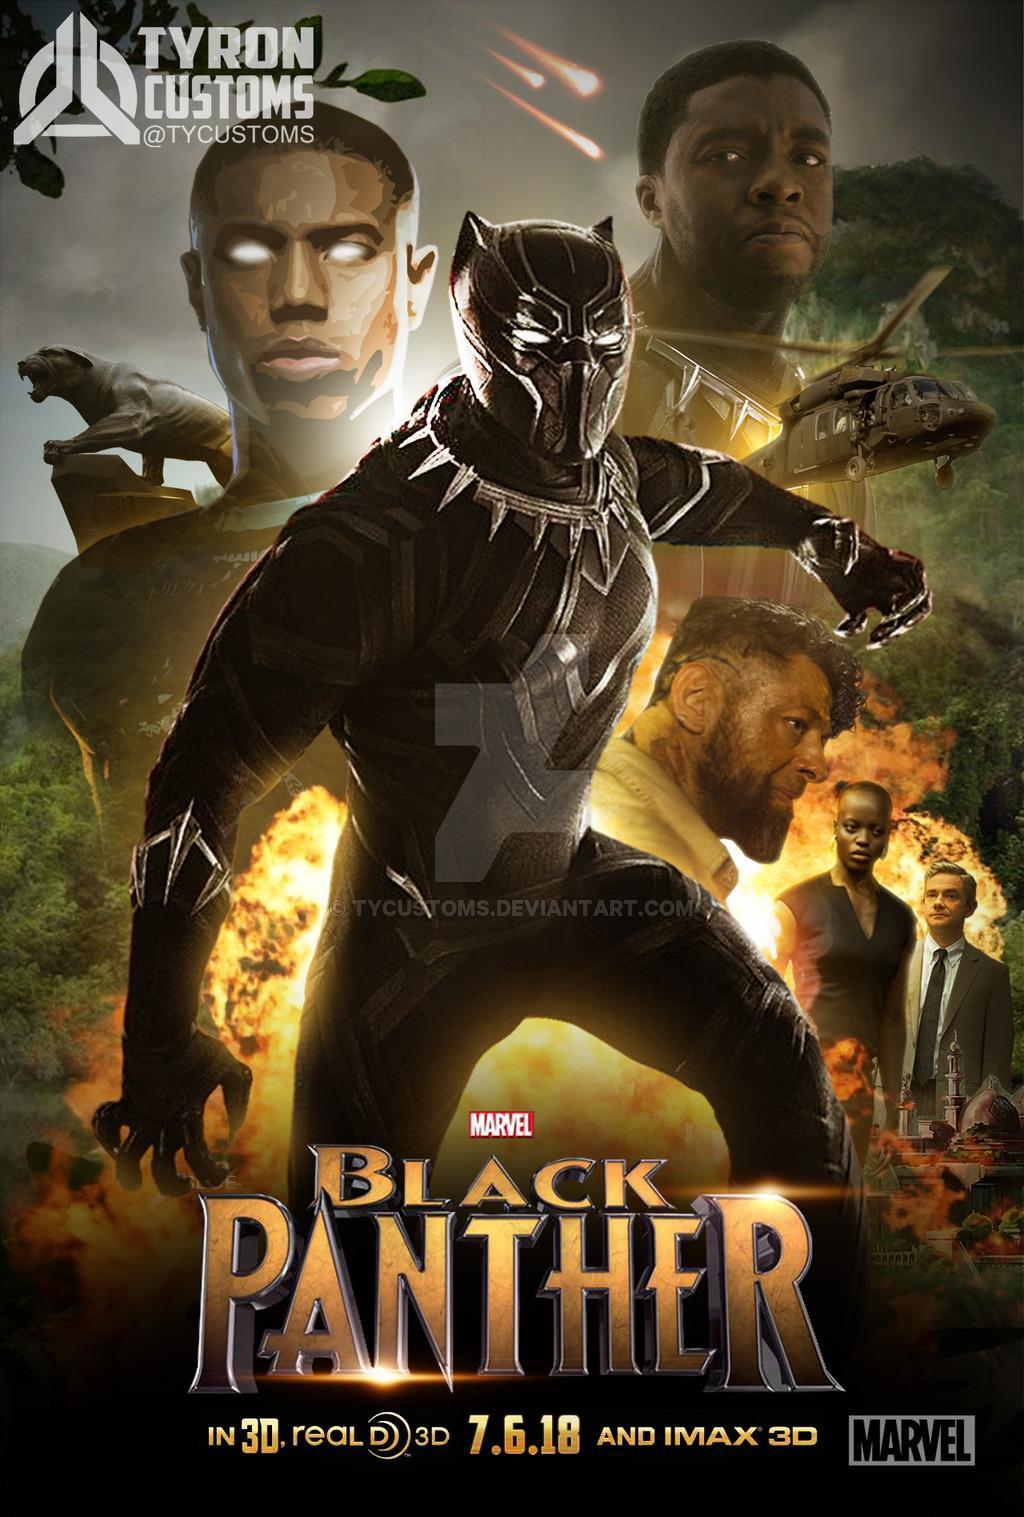 Black%20Panther%202018.3 1 دانلود فیلم Black Panther 2018 : کیفیت ۳D 1080p Bluray با حجم ۲۳ گیگابایت اضافه شد